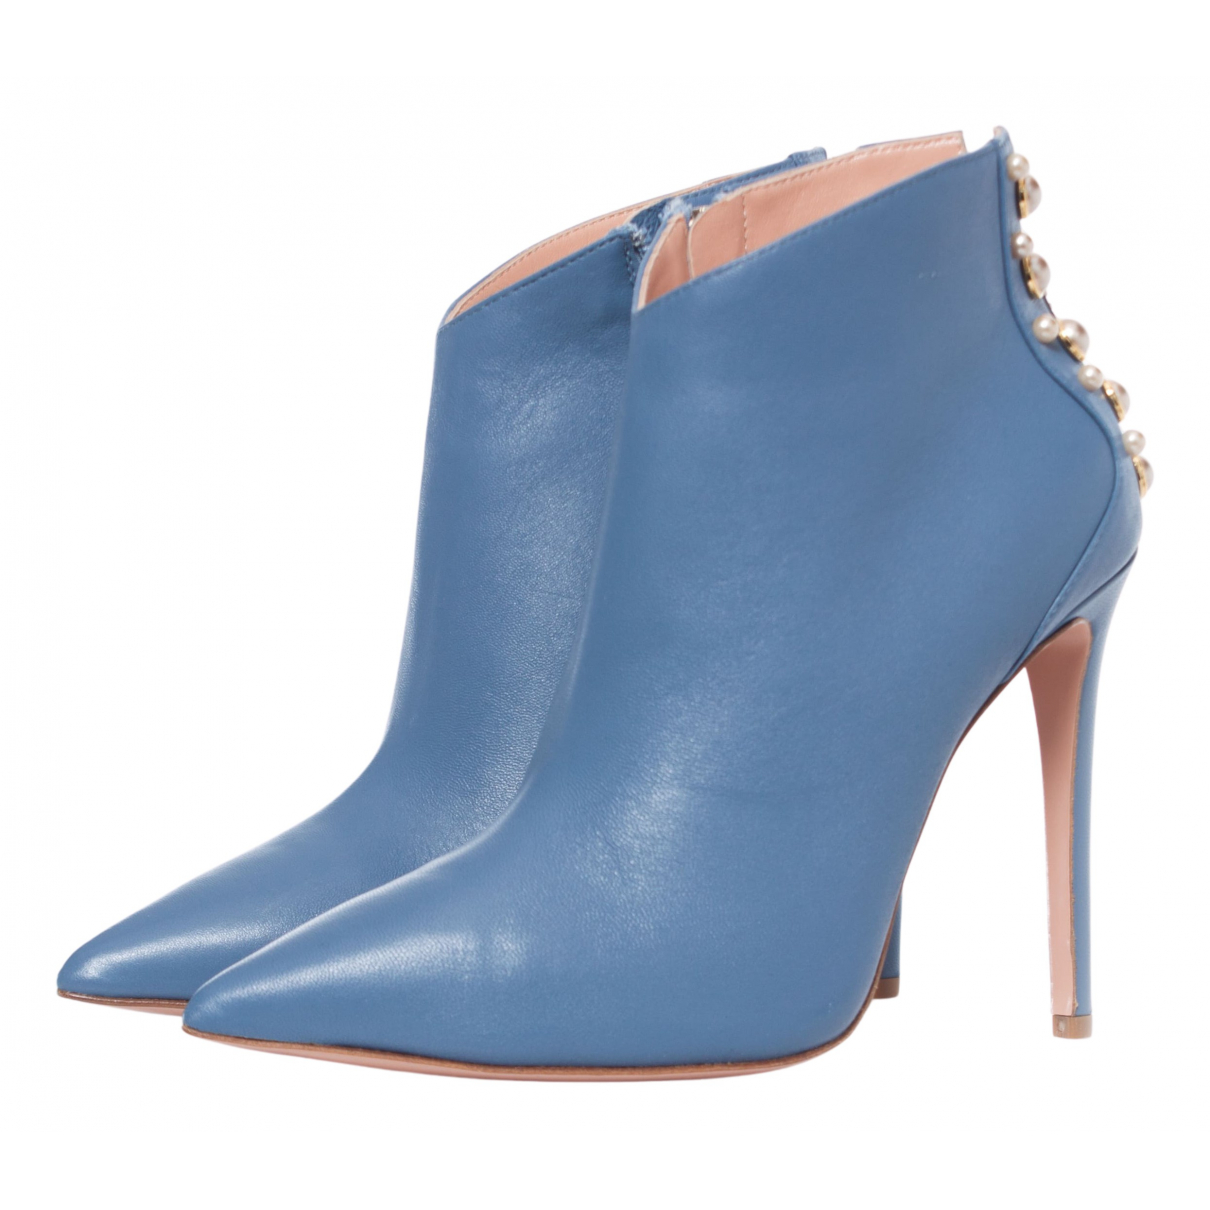 Elisabetta Franchi N Blue Leather Ankle boots for Women 38 EU